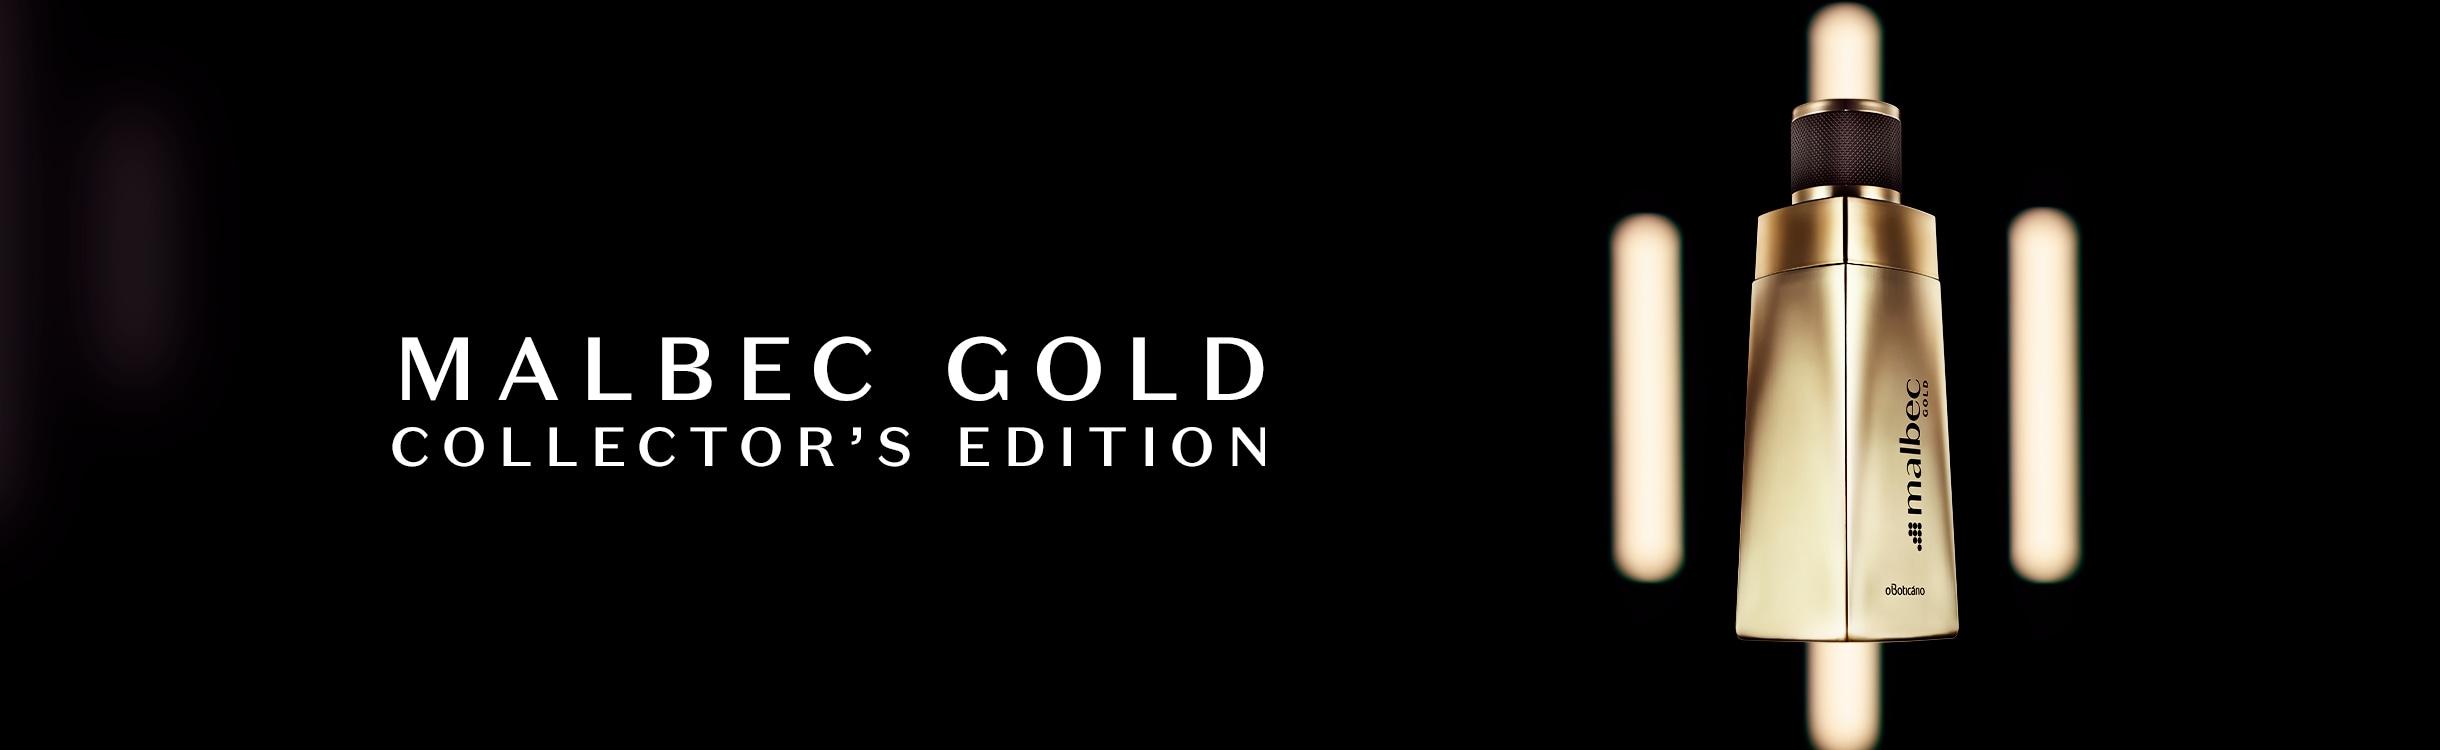 Malbec Gold